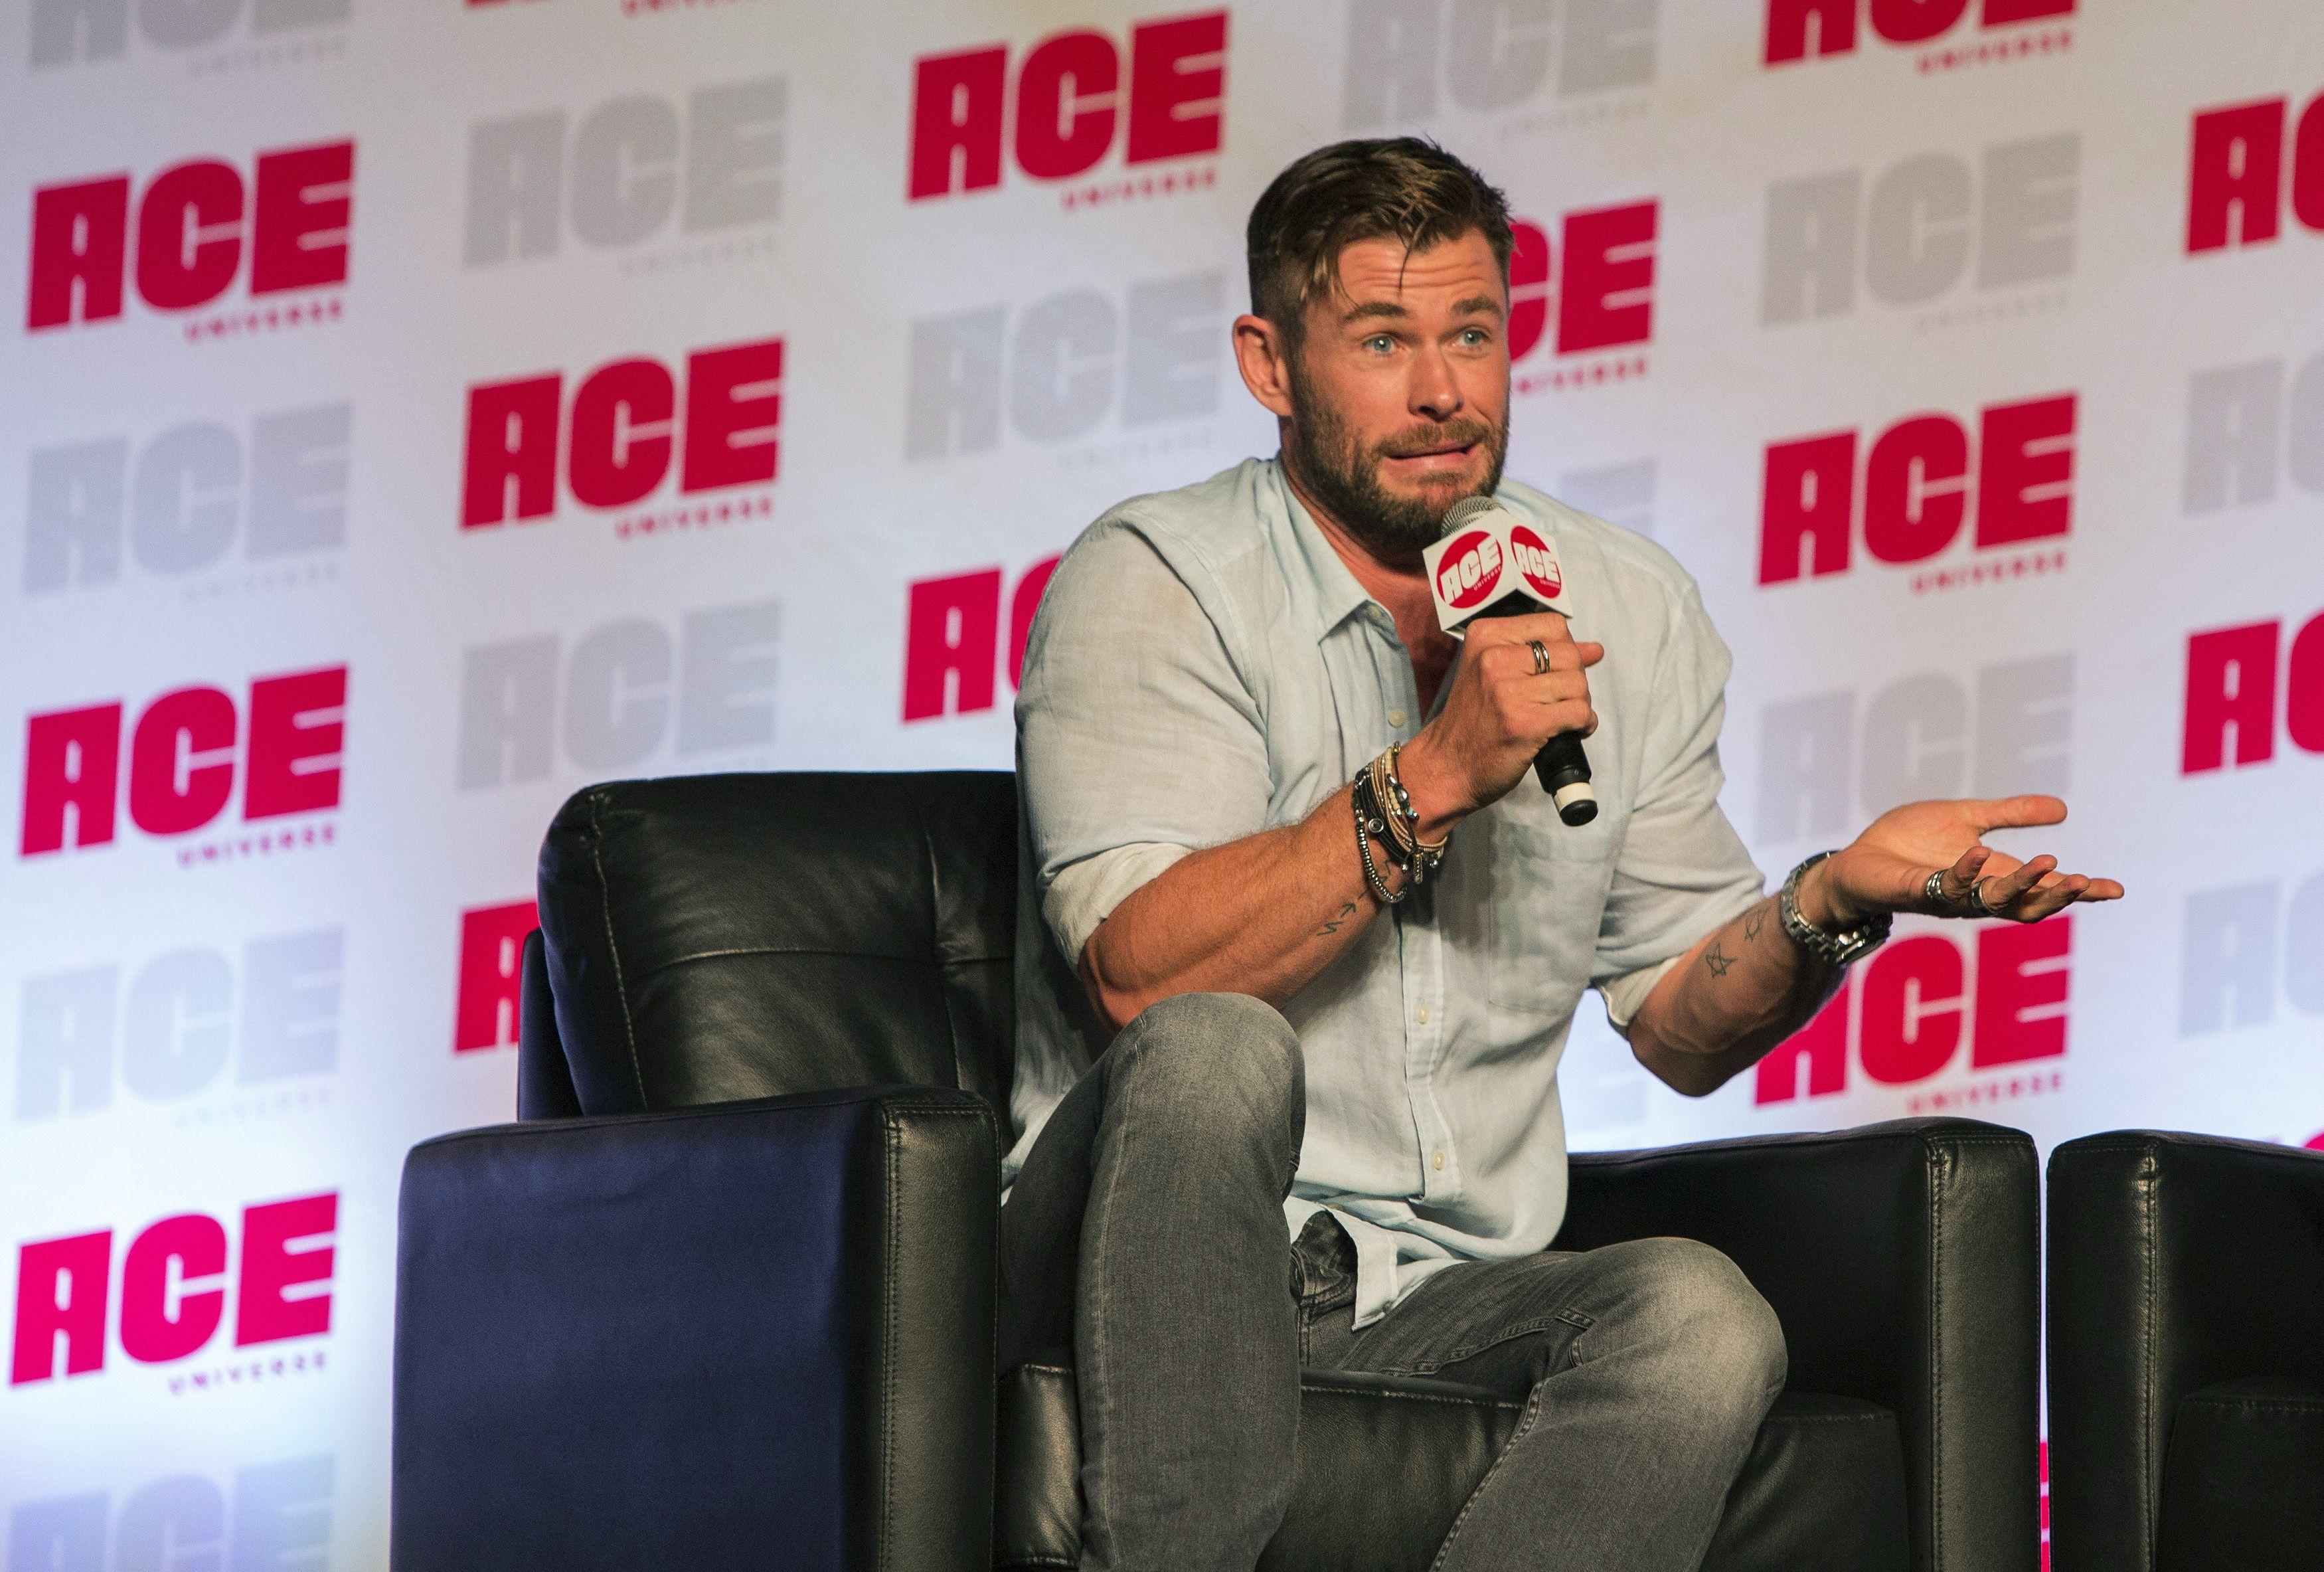 Chris Hemsworth y su vídeo viral firmando autógrafos